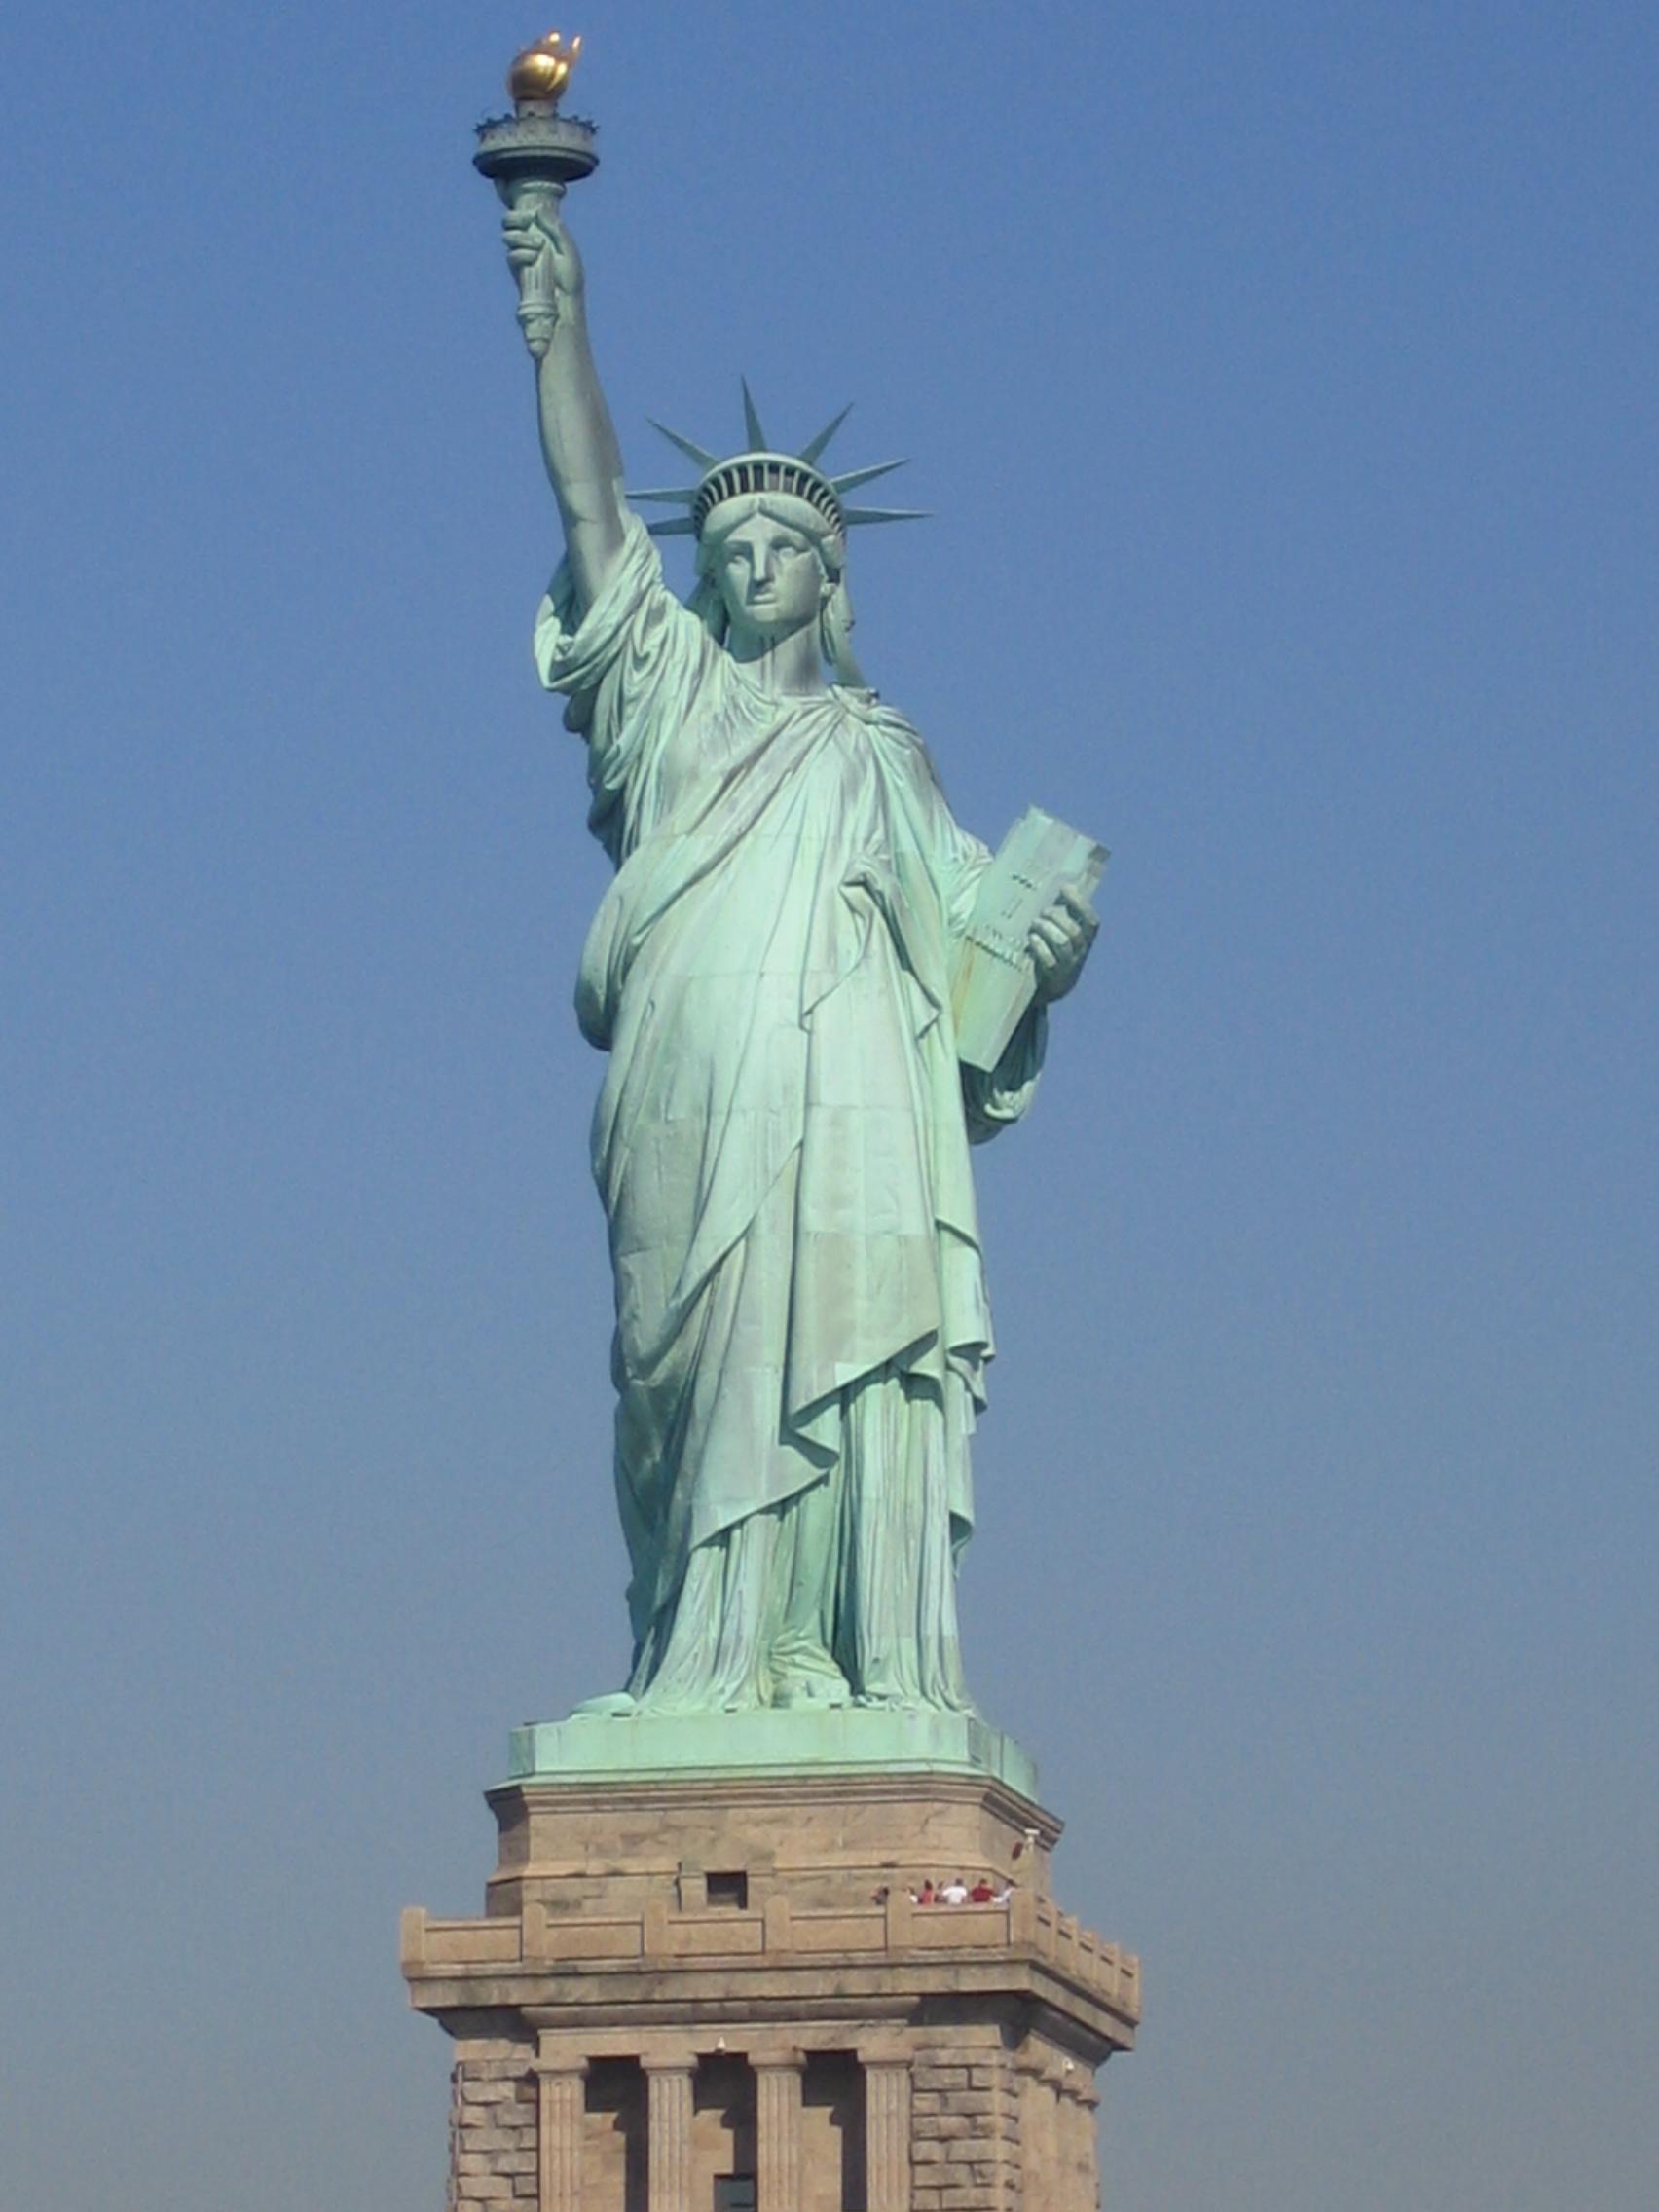 Personnes notables File:Statue-de-la-liberte-new-york.jpg - Wikimedia Commons QE18